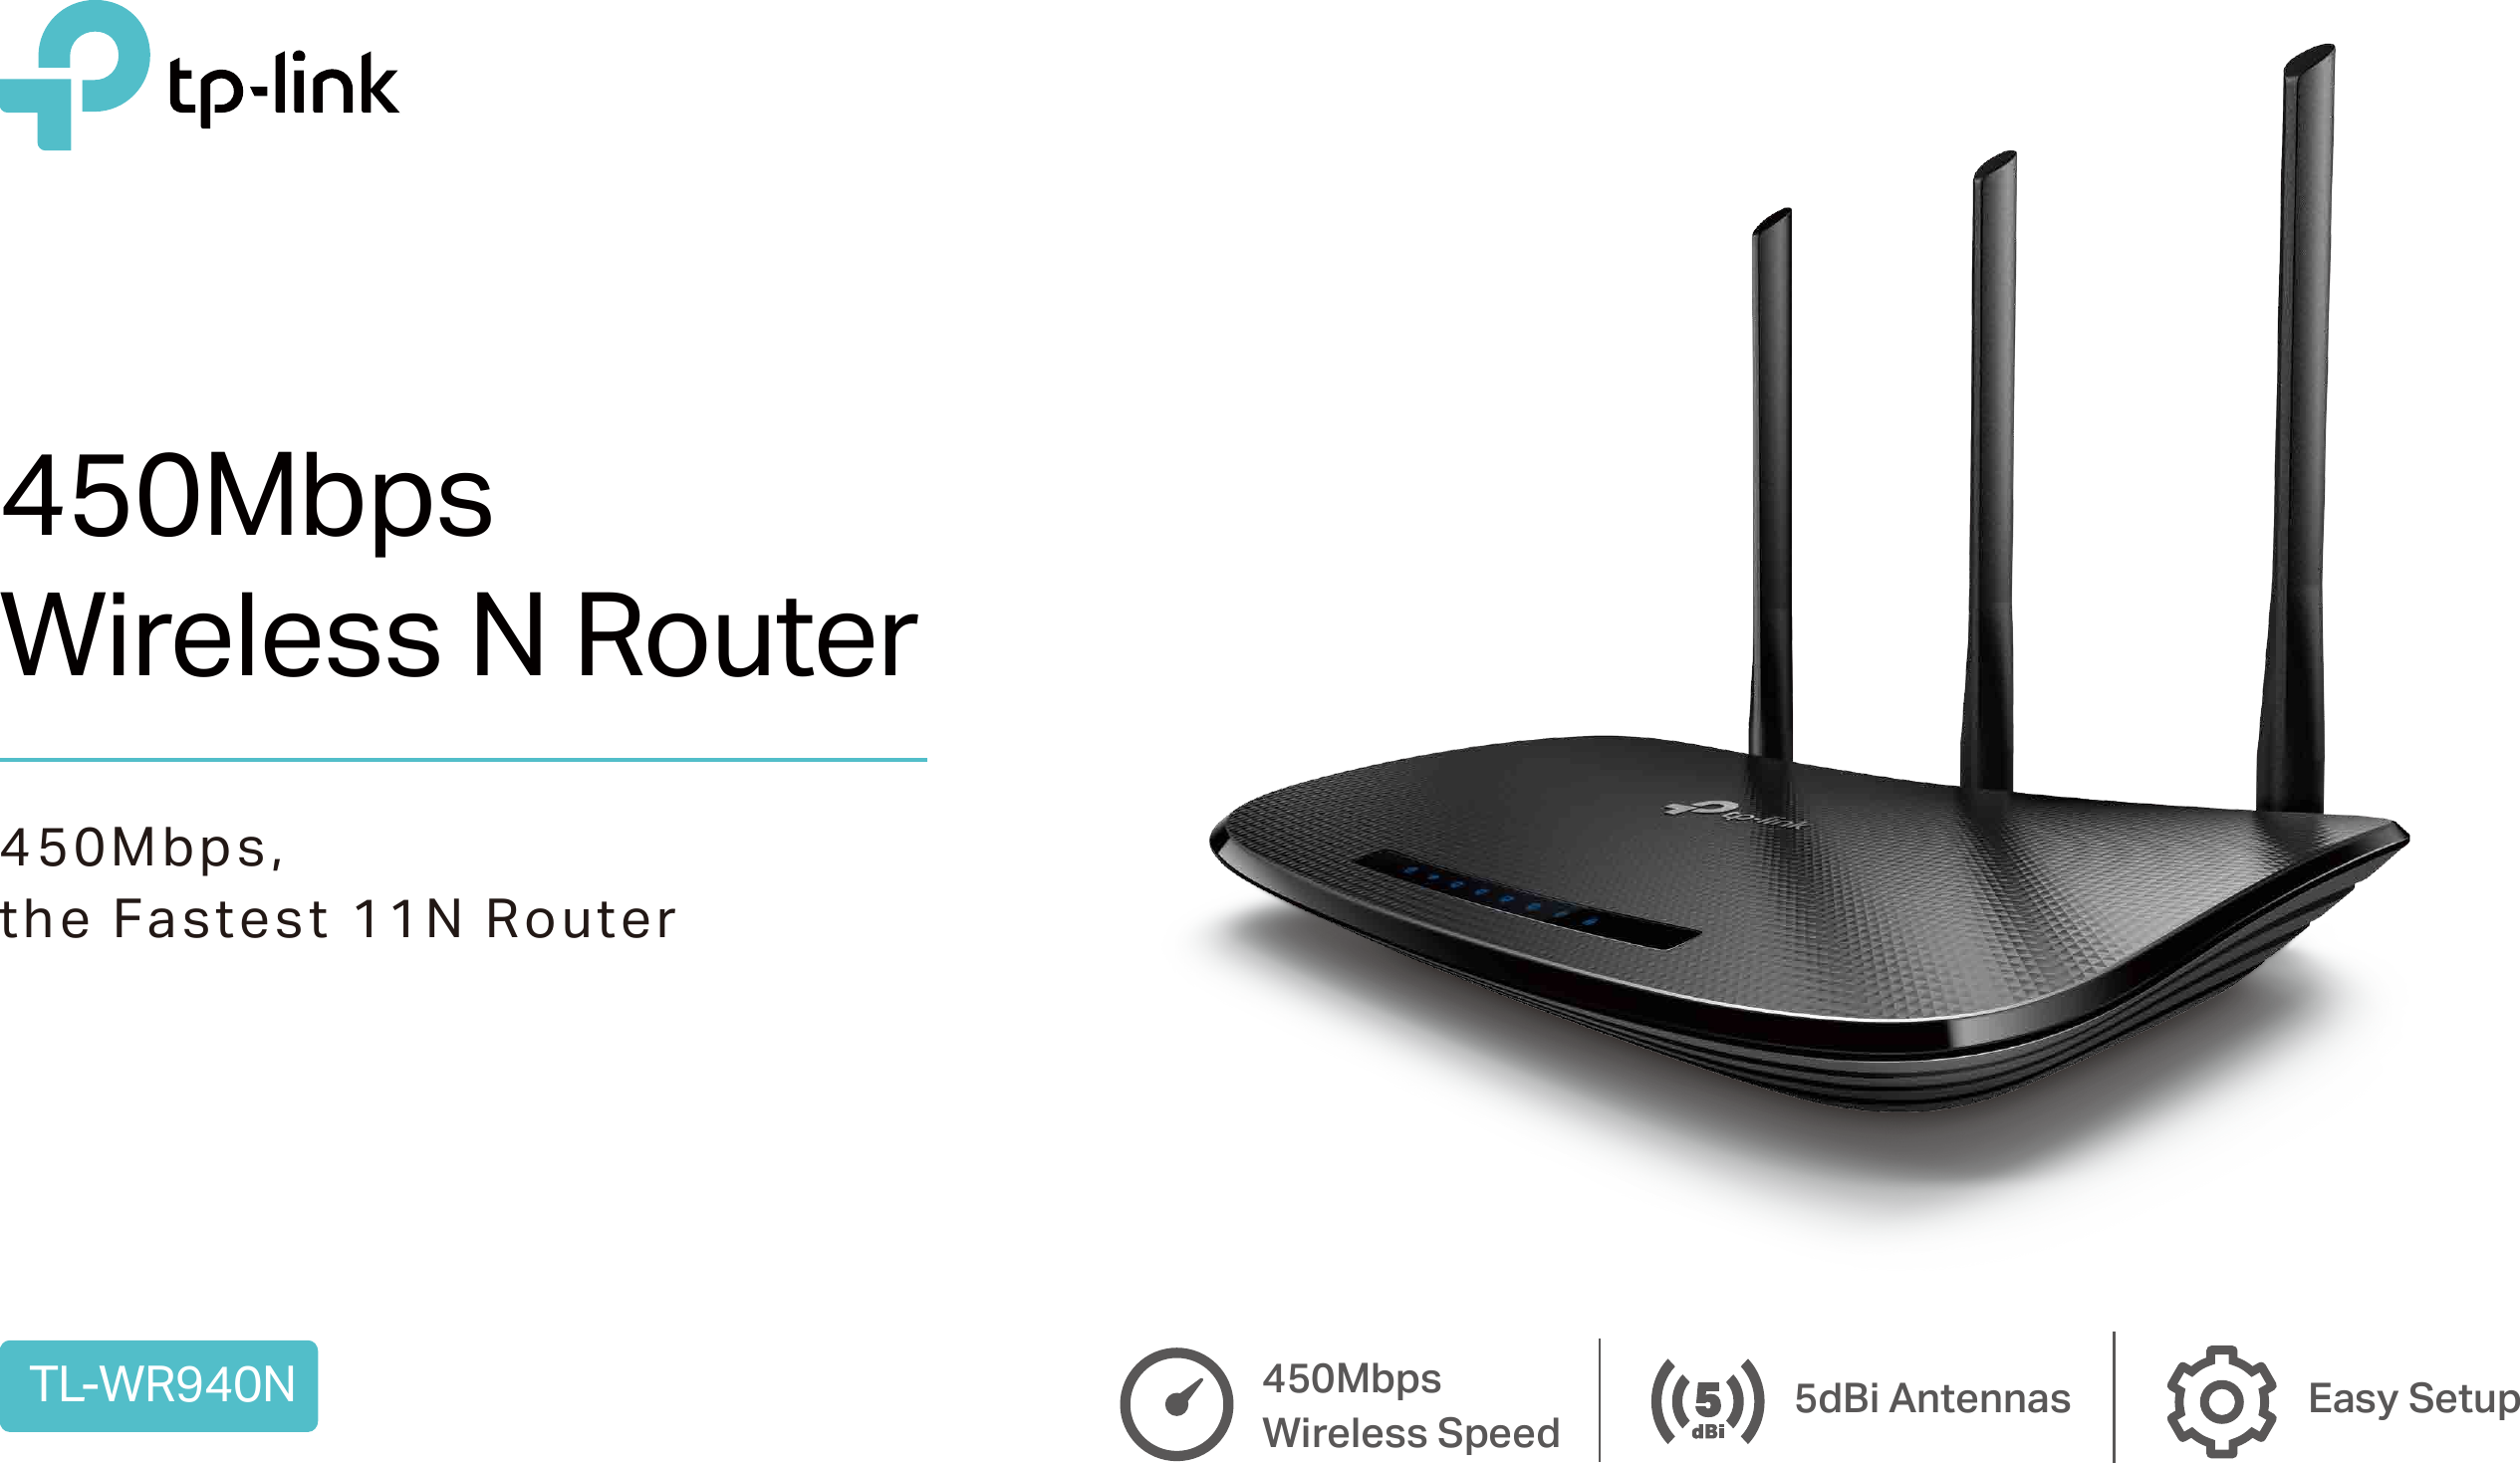 Tl Wr940neu50 Datasheet Wr940n V5 Tp Link Wireless Router 450mbps